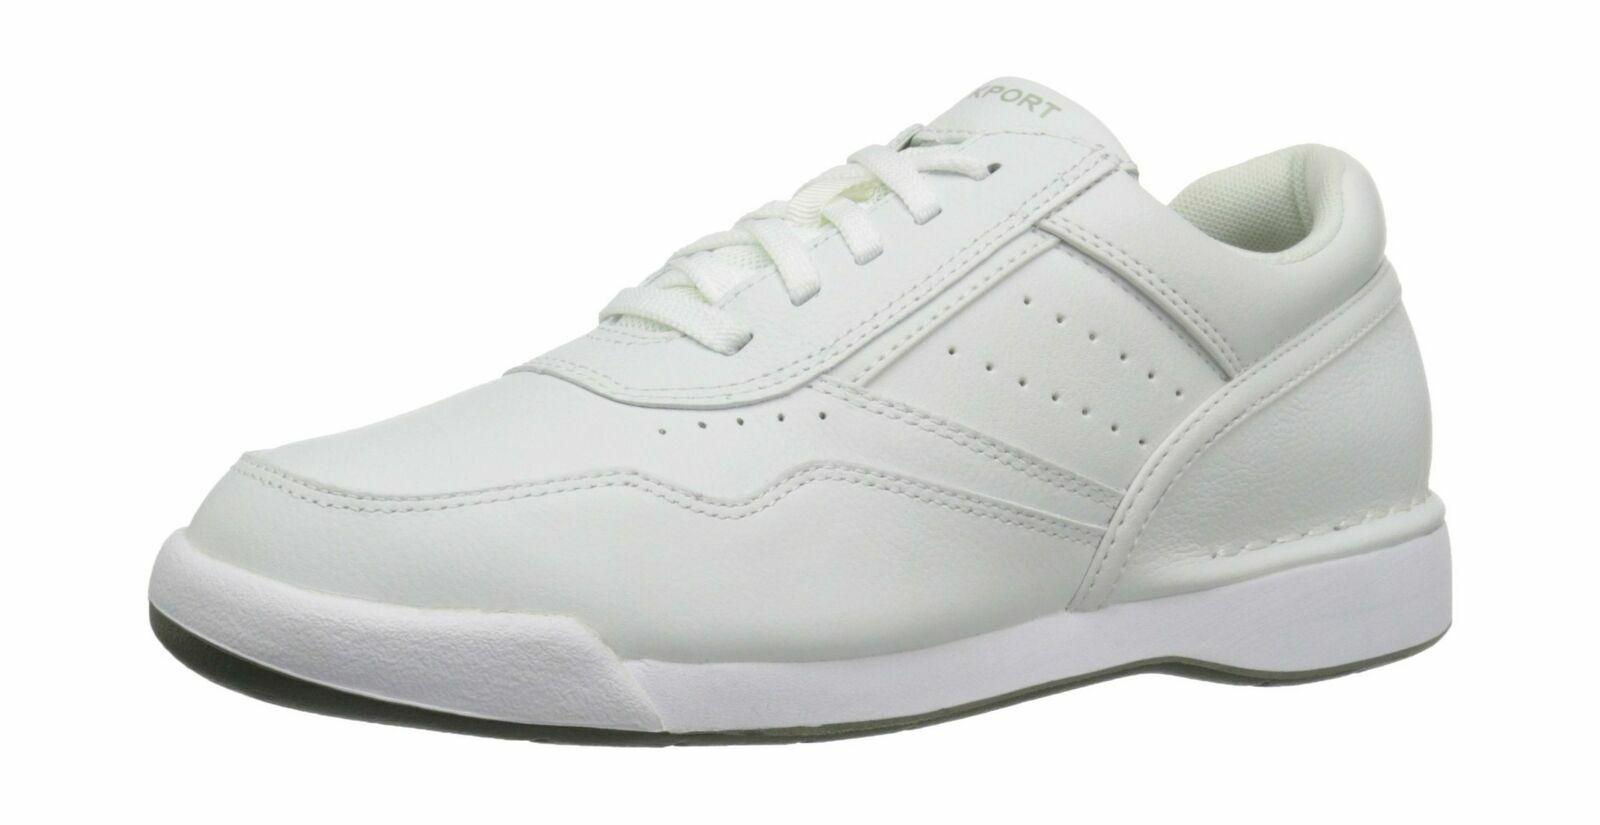 Rockport Rockport Rockport M7100 Prowalker herren UK 8   EU 42 all Weiß leather casual K71098 NEW bc0